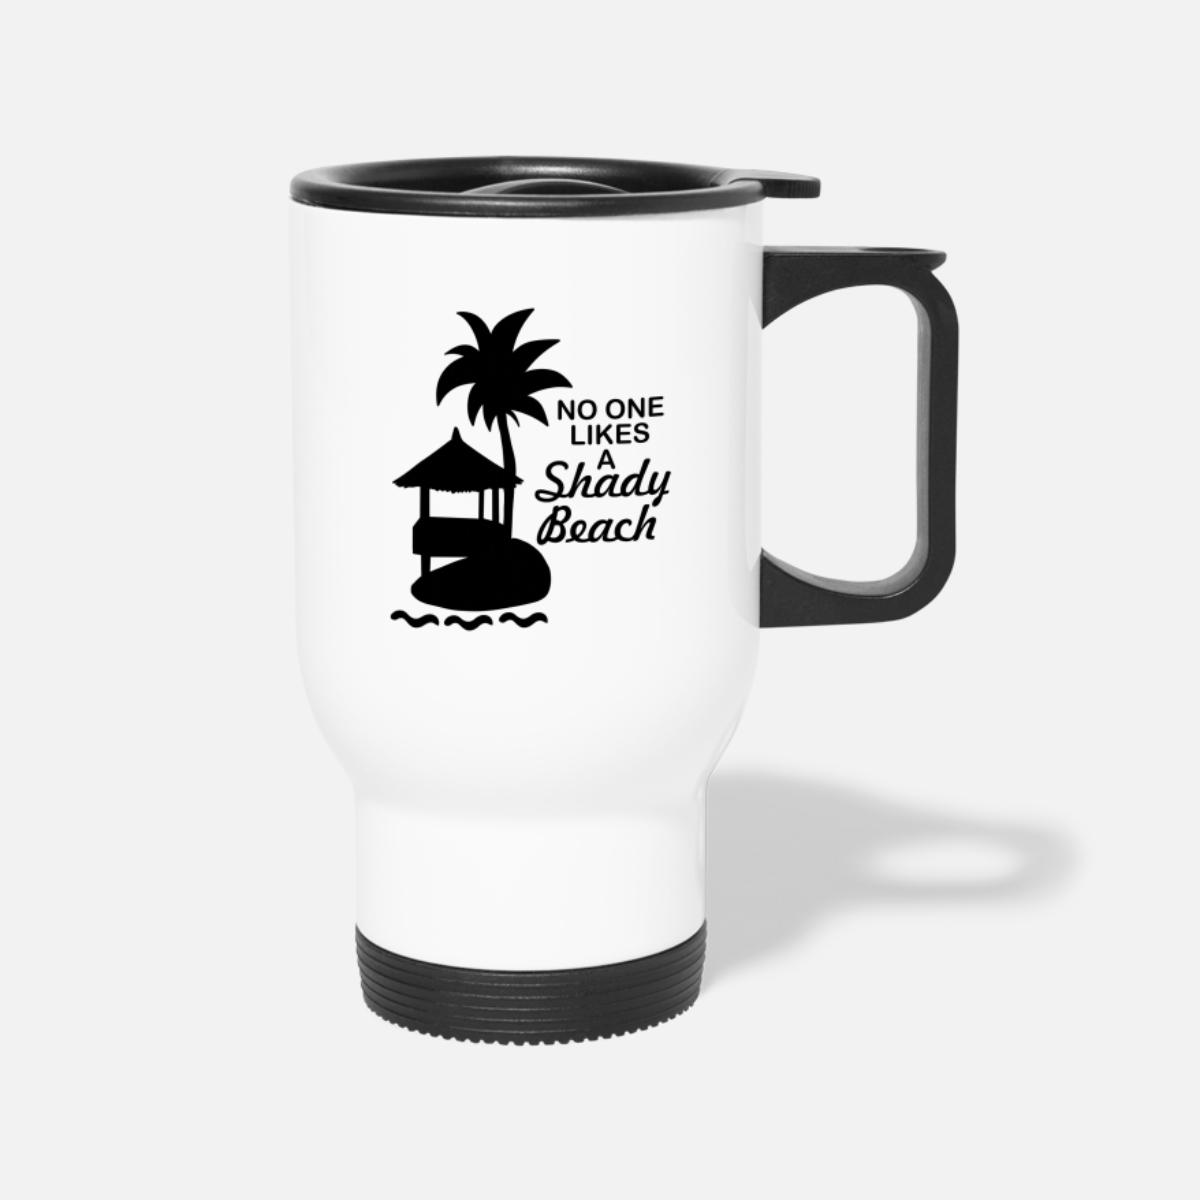 0fa87e82b18 No one likes a shady beach Travel Mug - white